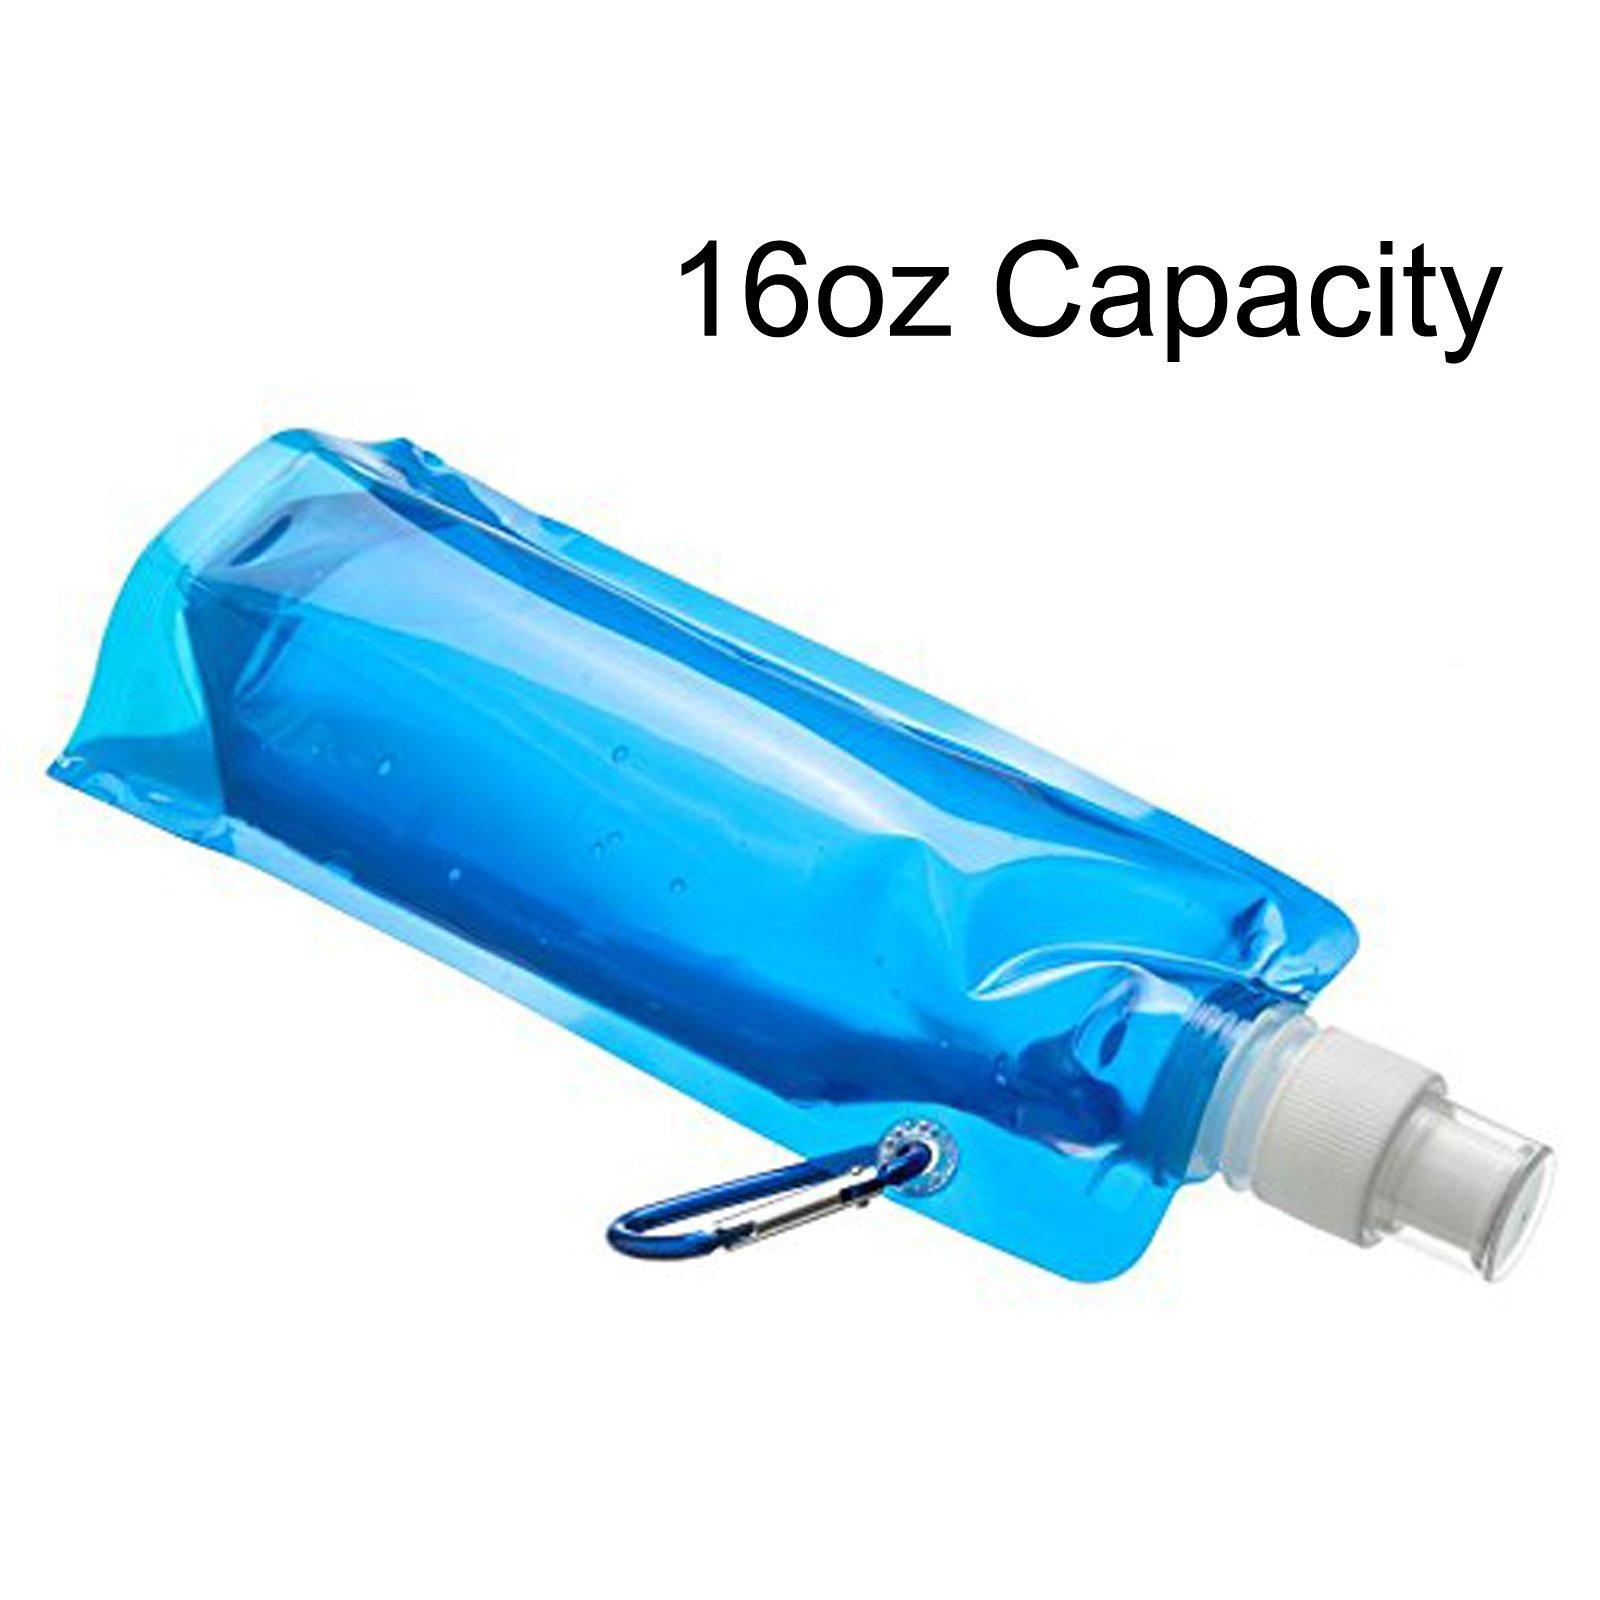 ASR Outdoor Ultralight Sports Bottle 16oz Capacity TSA Compliant Food Grade Blue